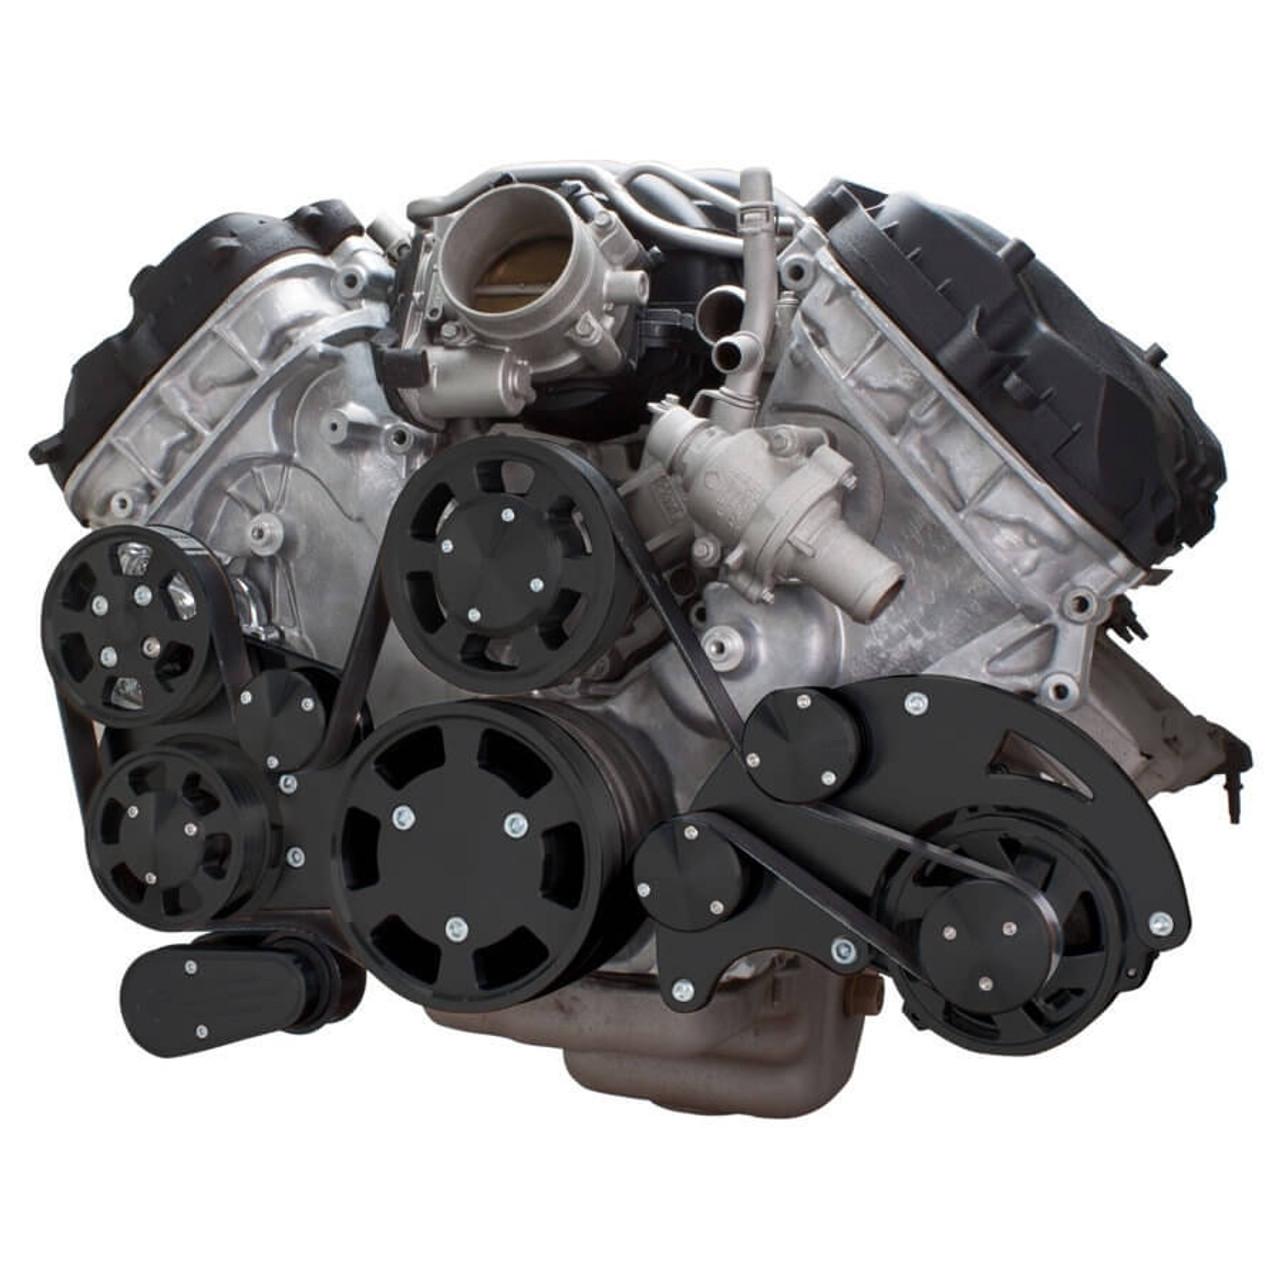 stealth black serpentine conversion kit for ford coyote 5 0 with ac rh cvfracing com Ford Alternator Circuit Ford Explorer Alternator Diagram